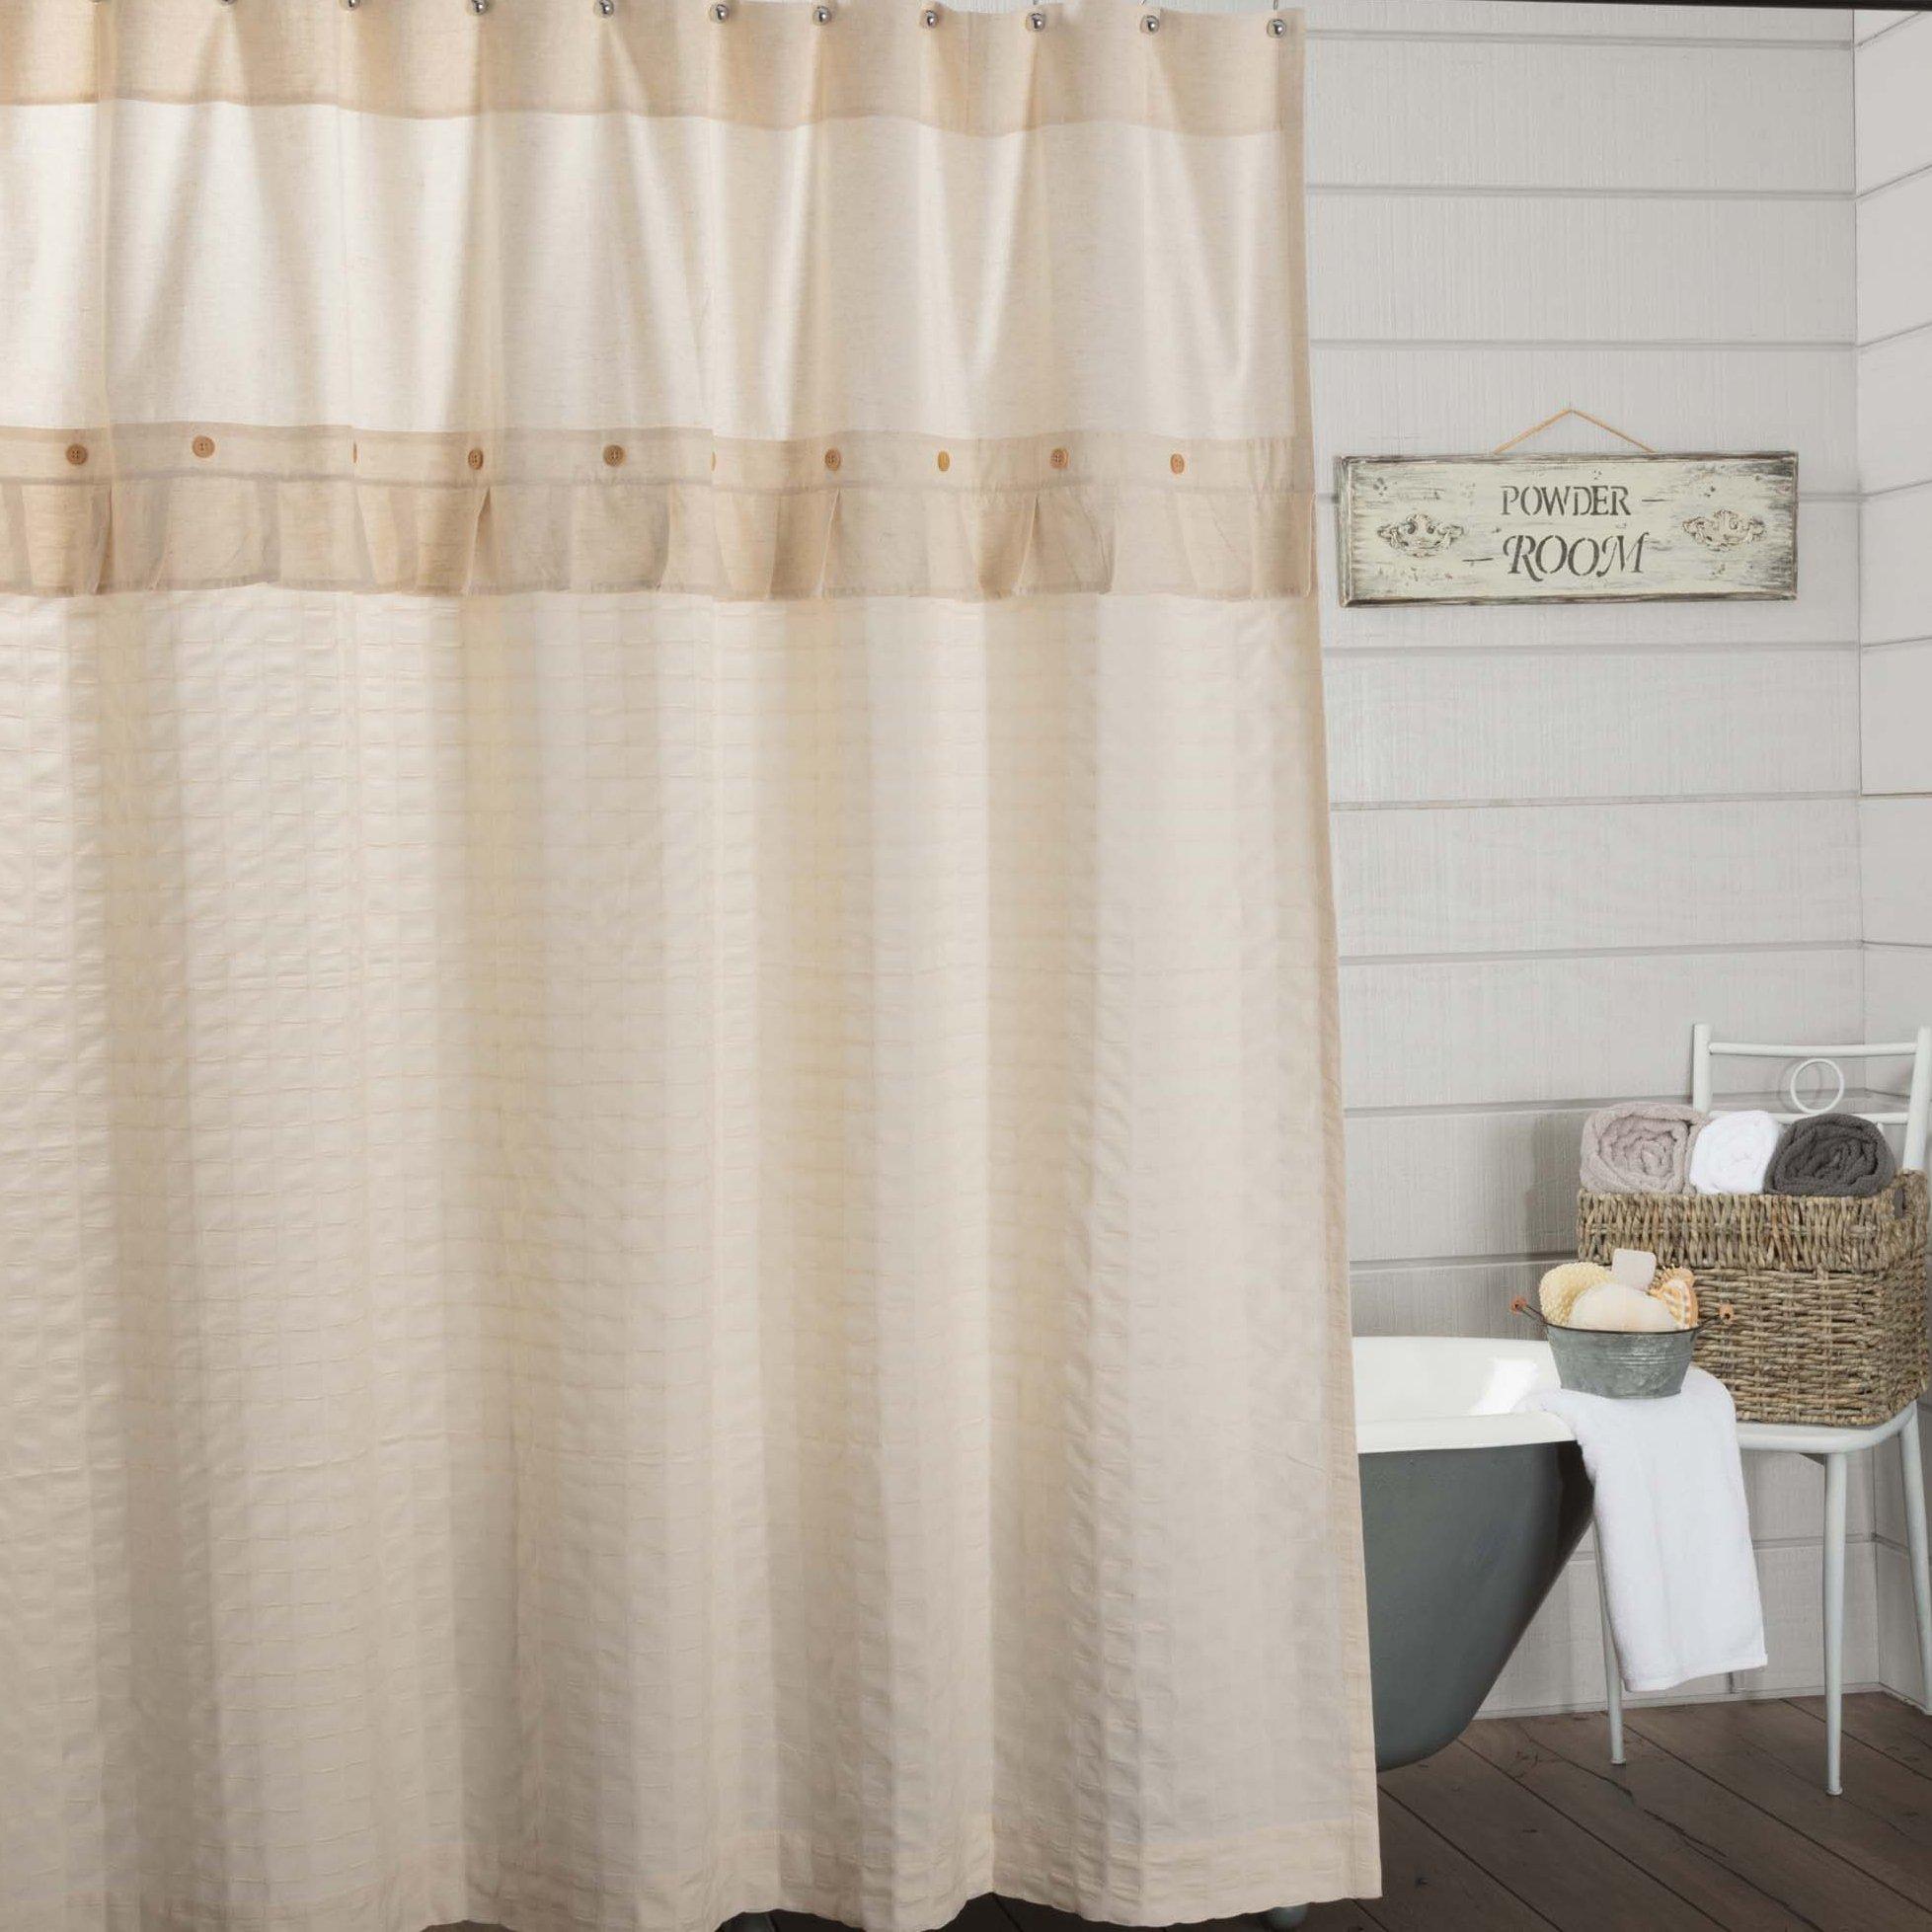 Details About Claras Cottage Natural Shower Curtain 72x72 Linen Look Cream Farmhouse